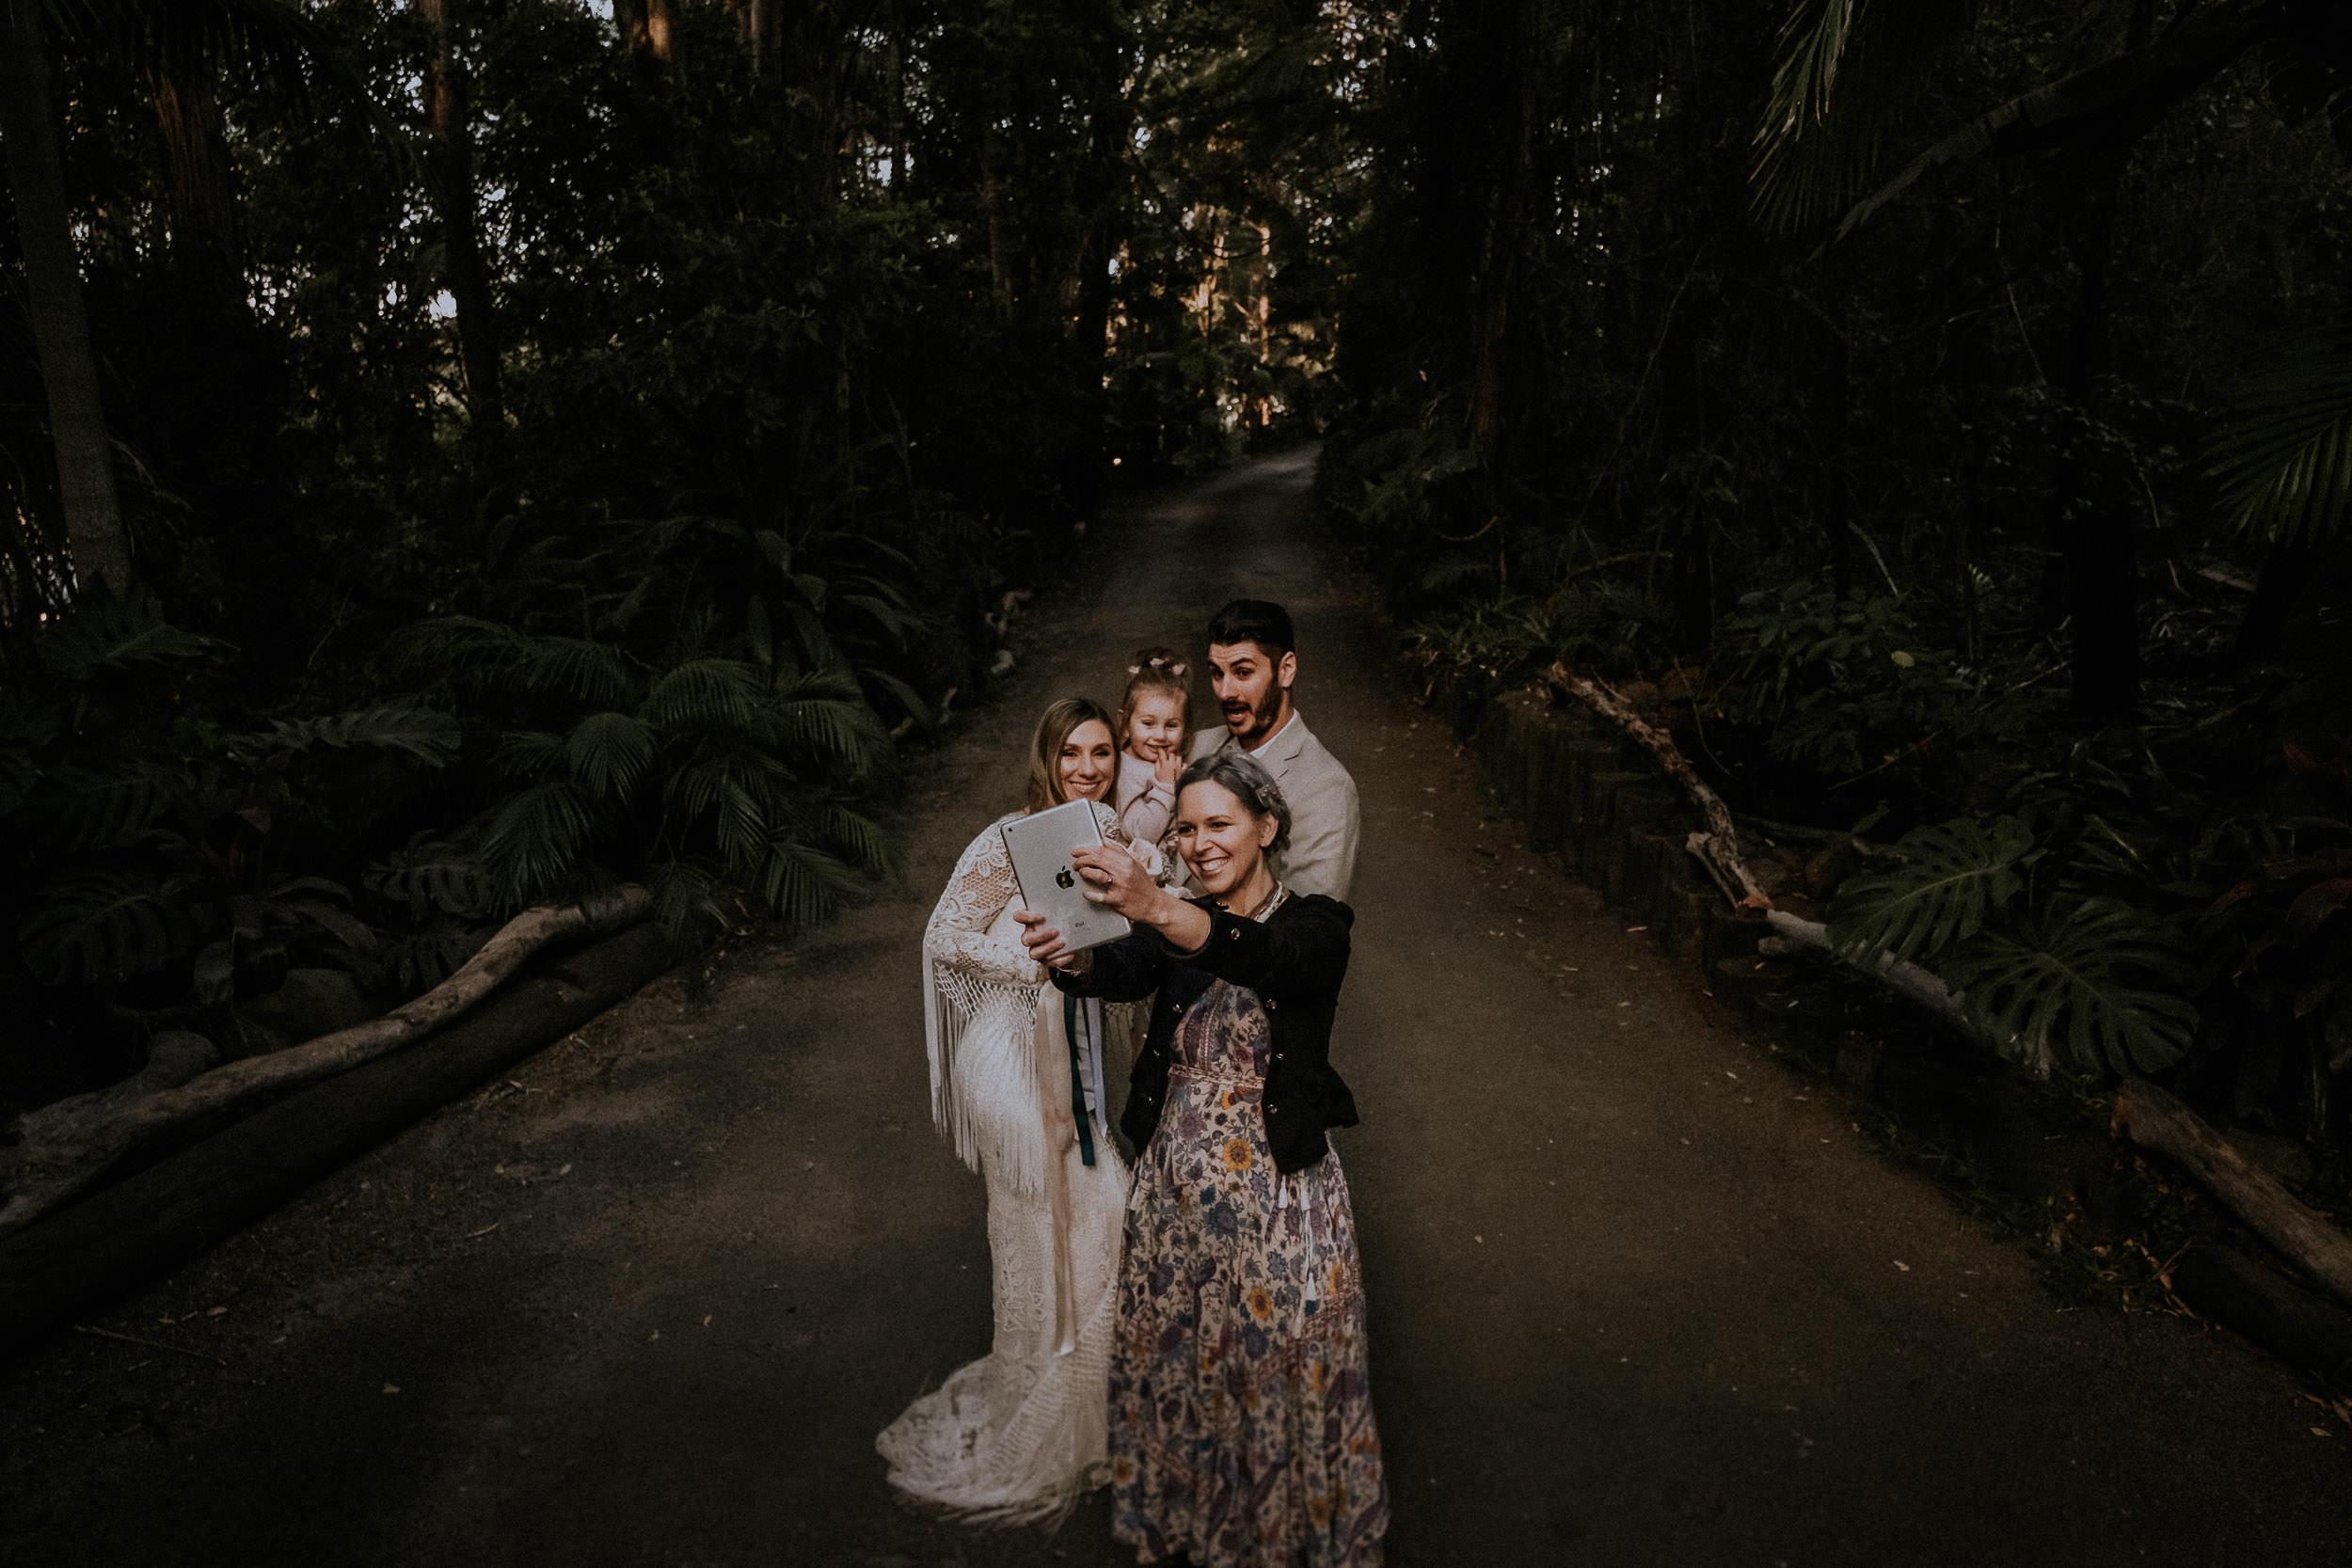 S&A Elopement - Kings & Thieves - Shred 'Til Dead - Central Coast Beach Forest Wedding - 314.jpg